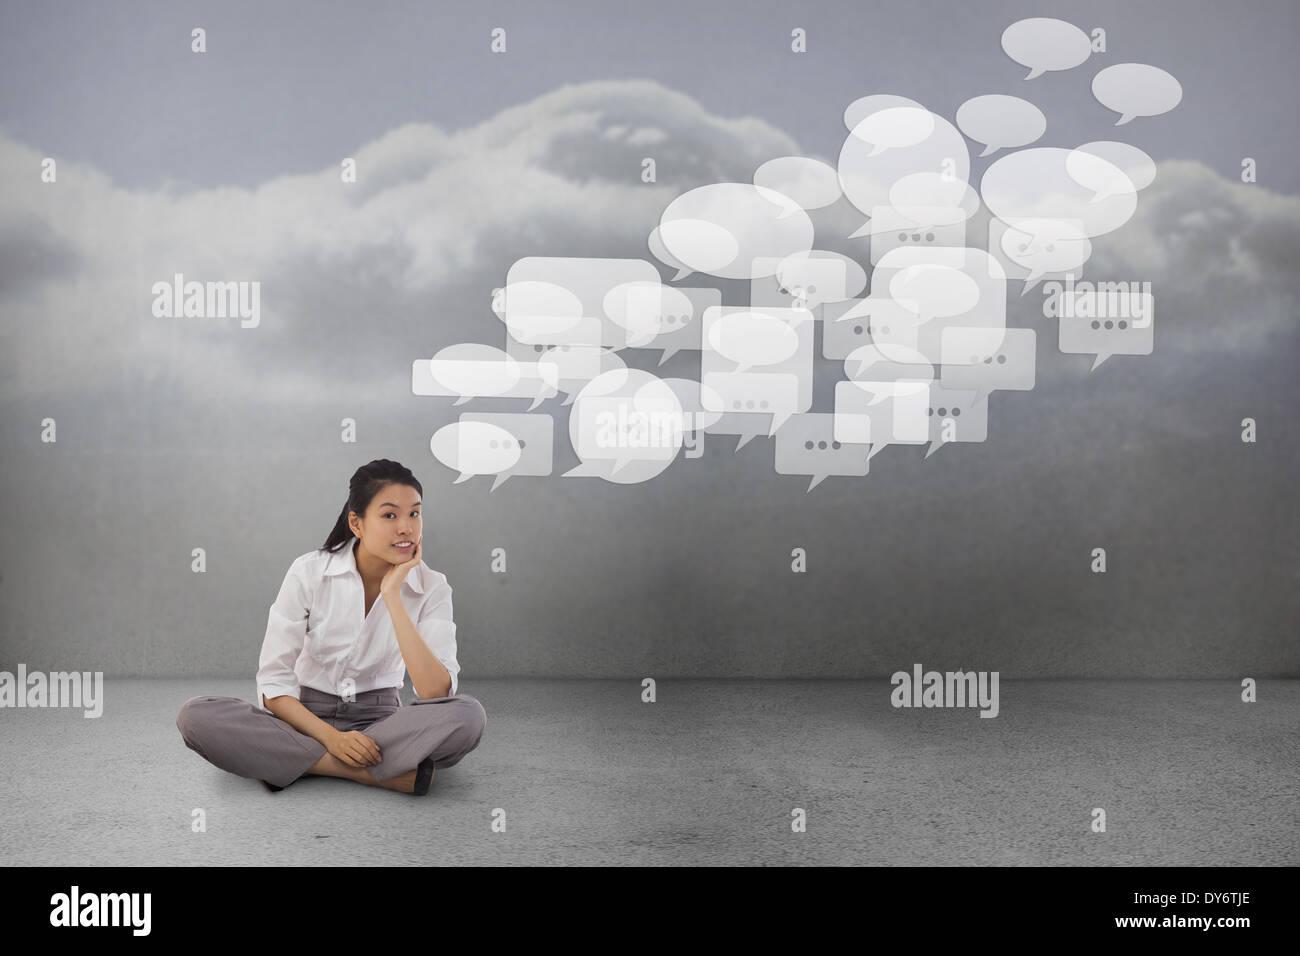 Composite image of businesswoman sitting cross legged thinking - Stock Image